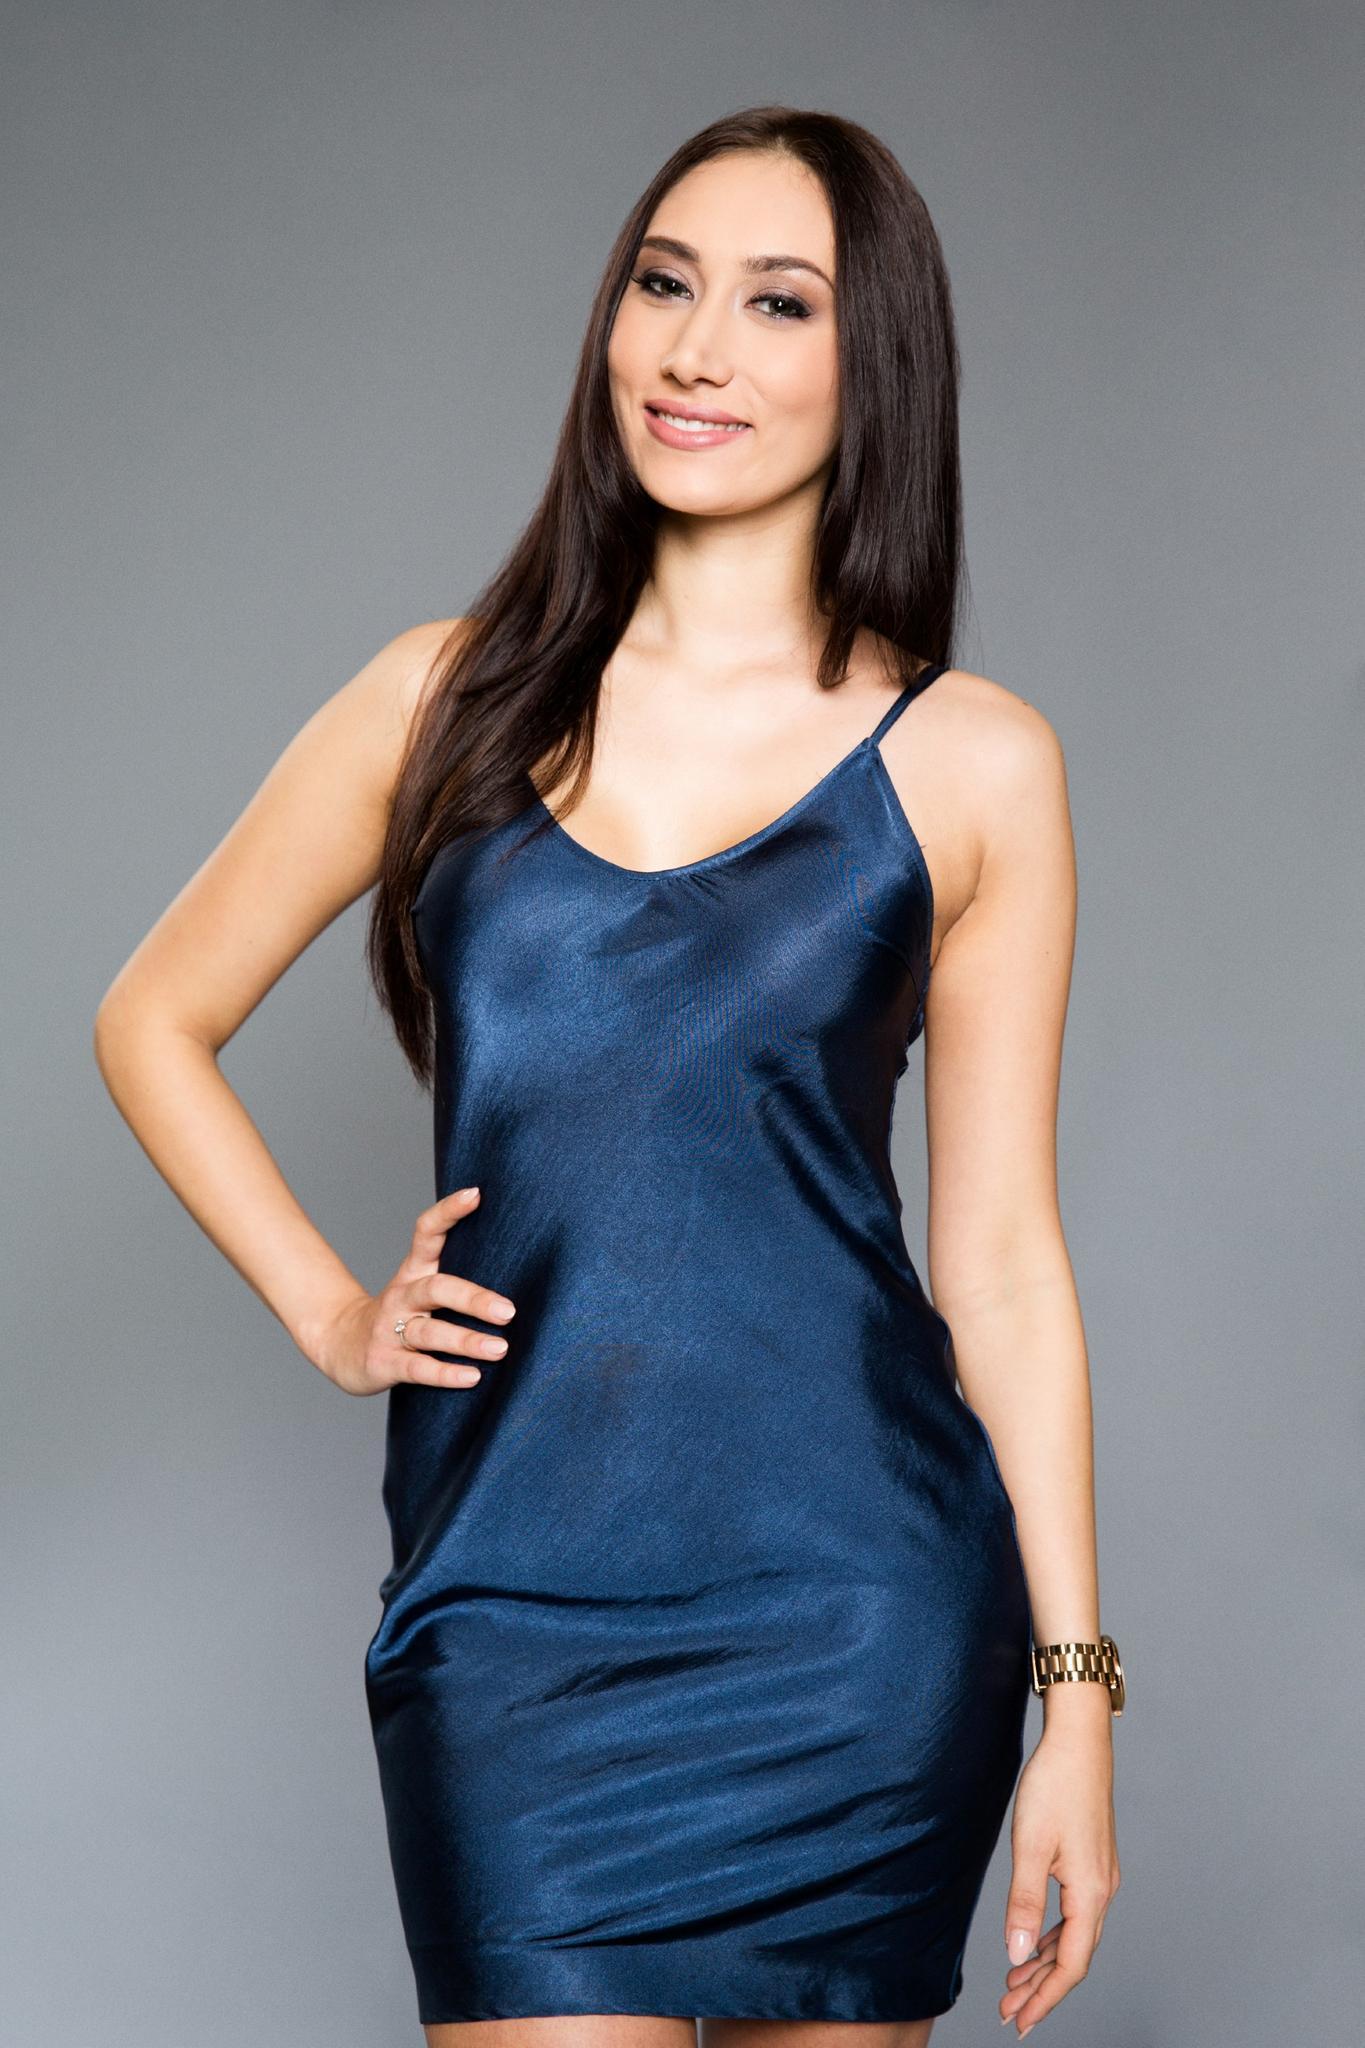 Bachelor- Kandidatin Samira